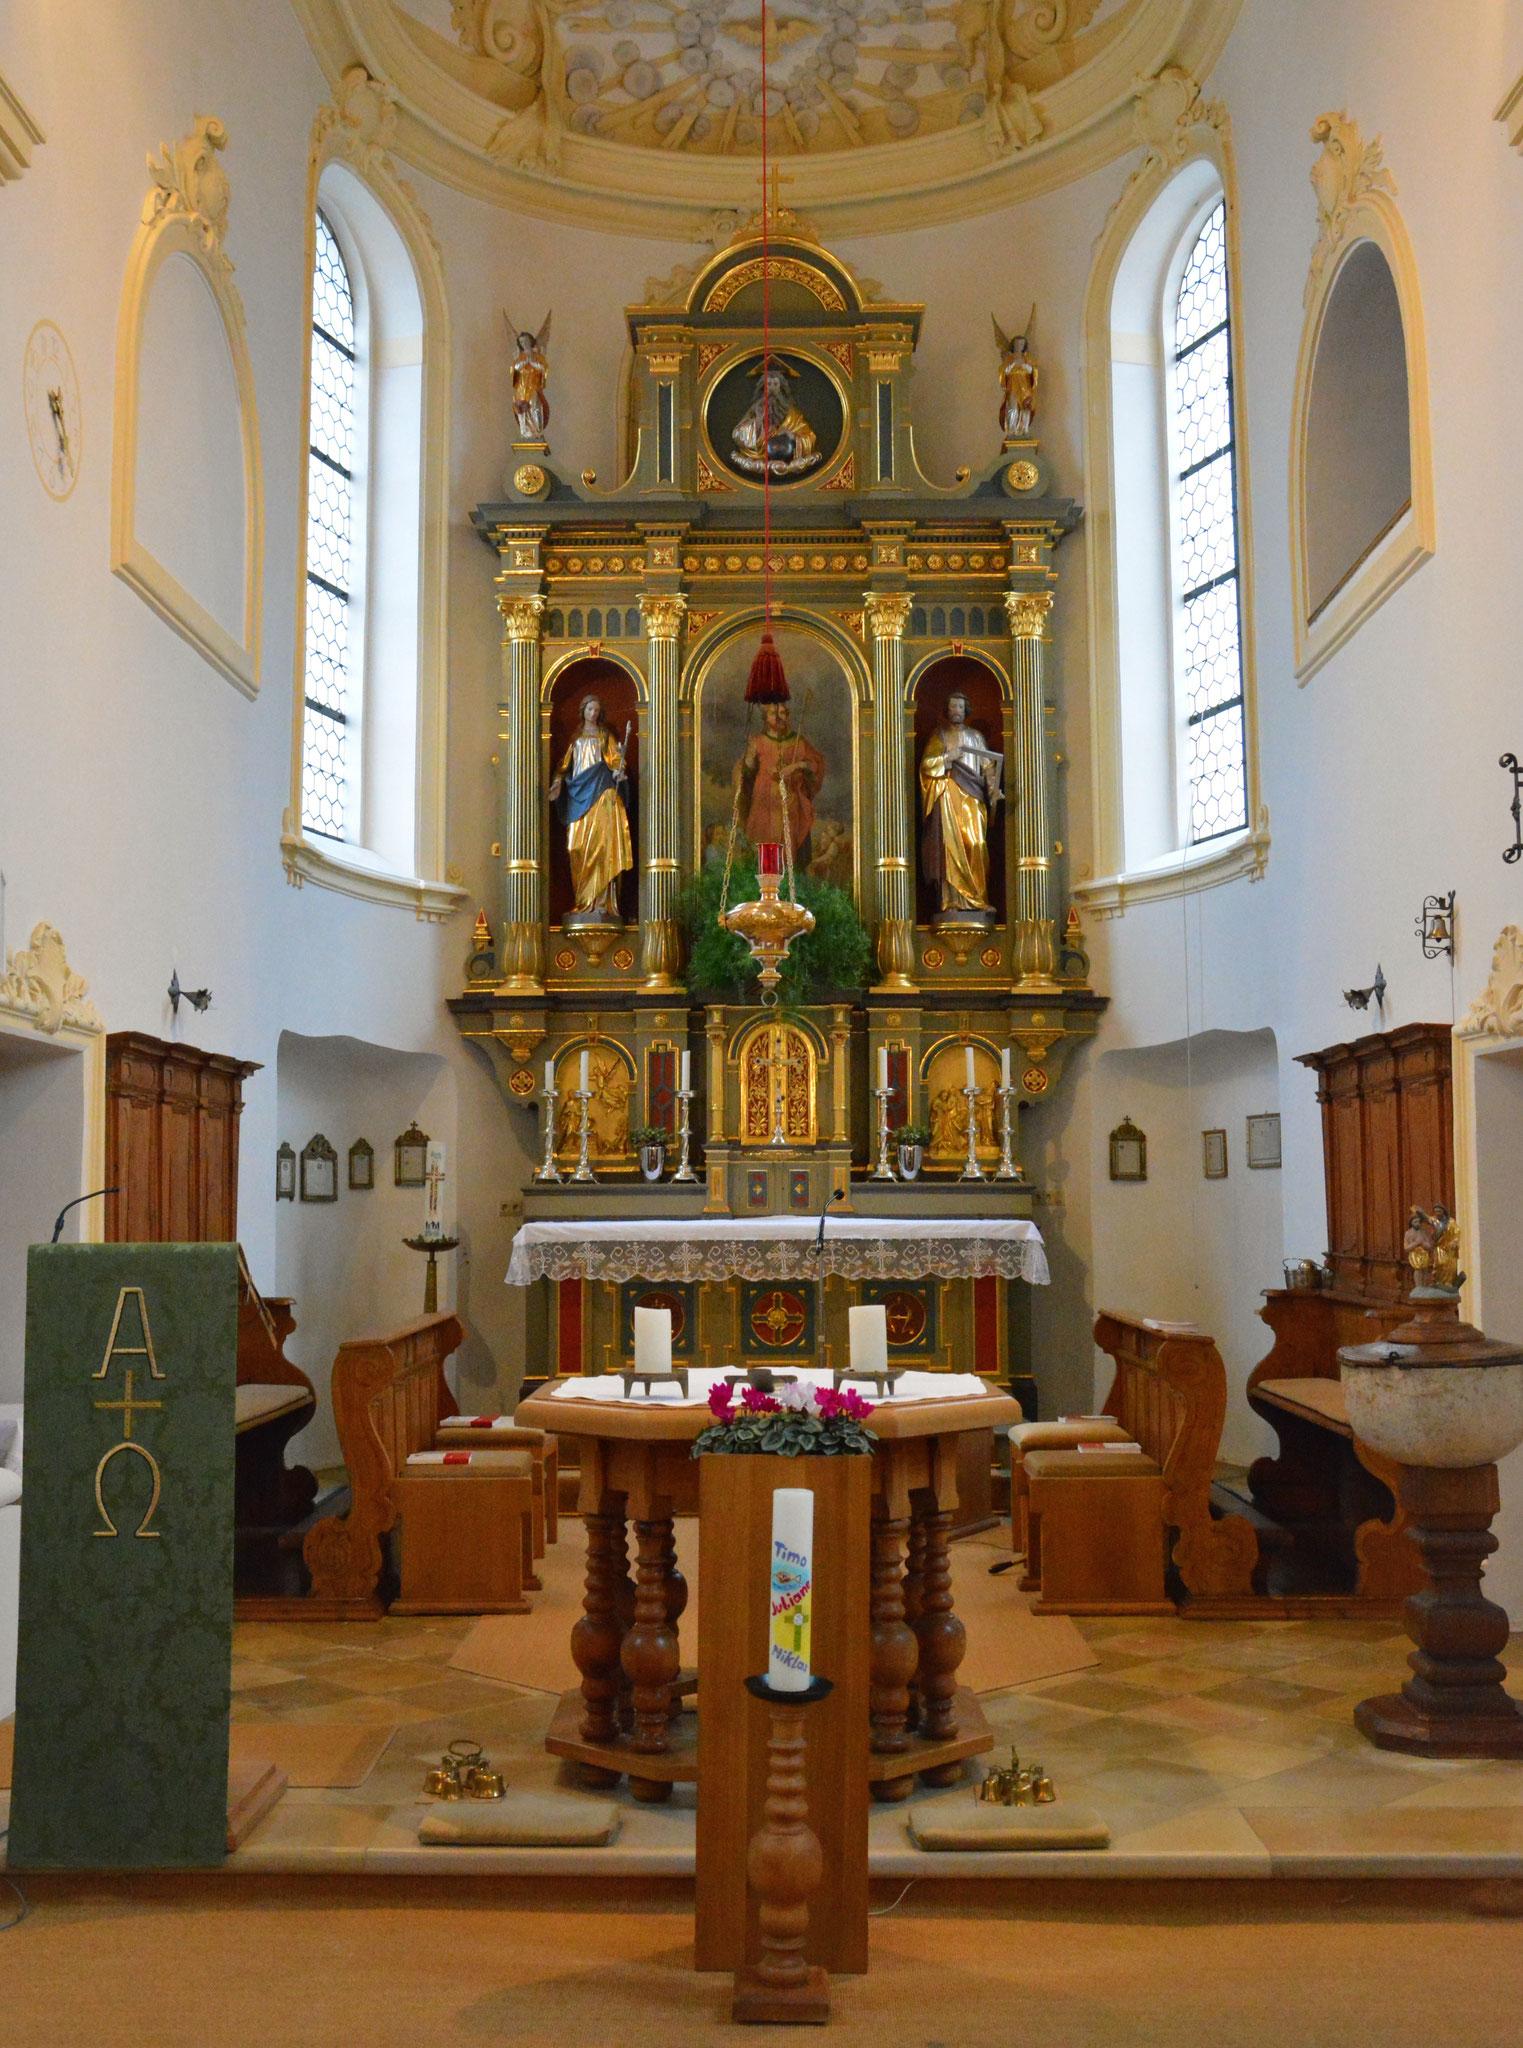 Altarraum mit Tabernakel